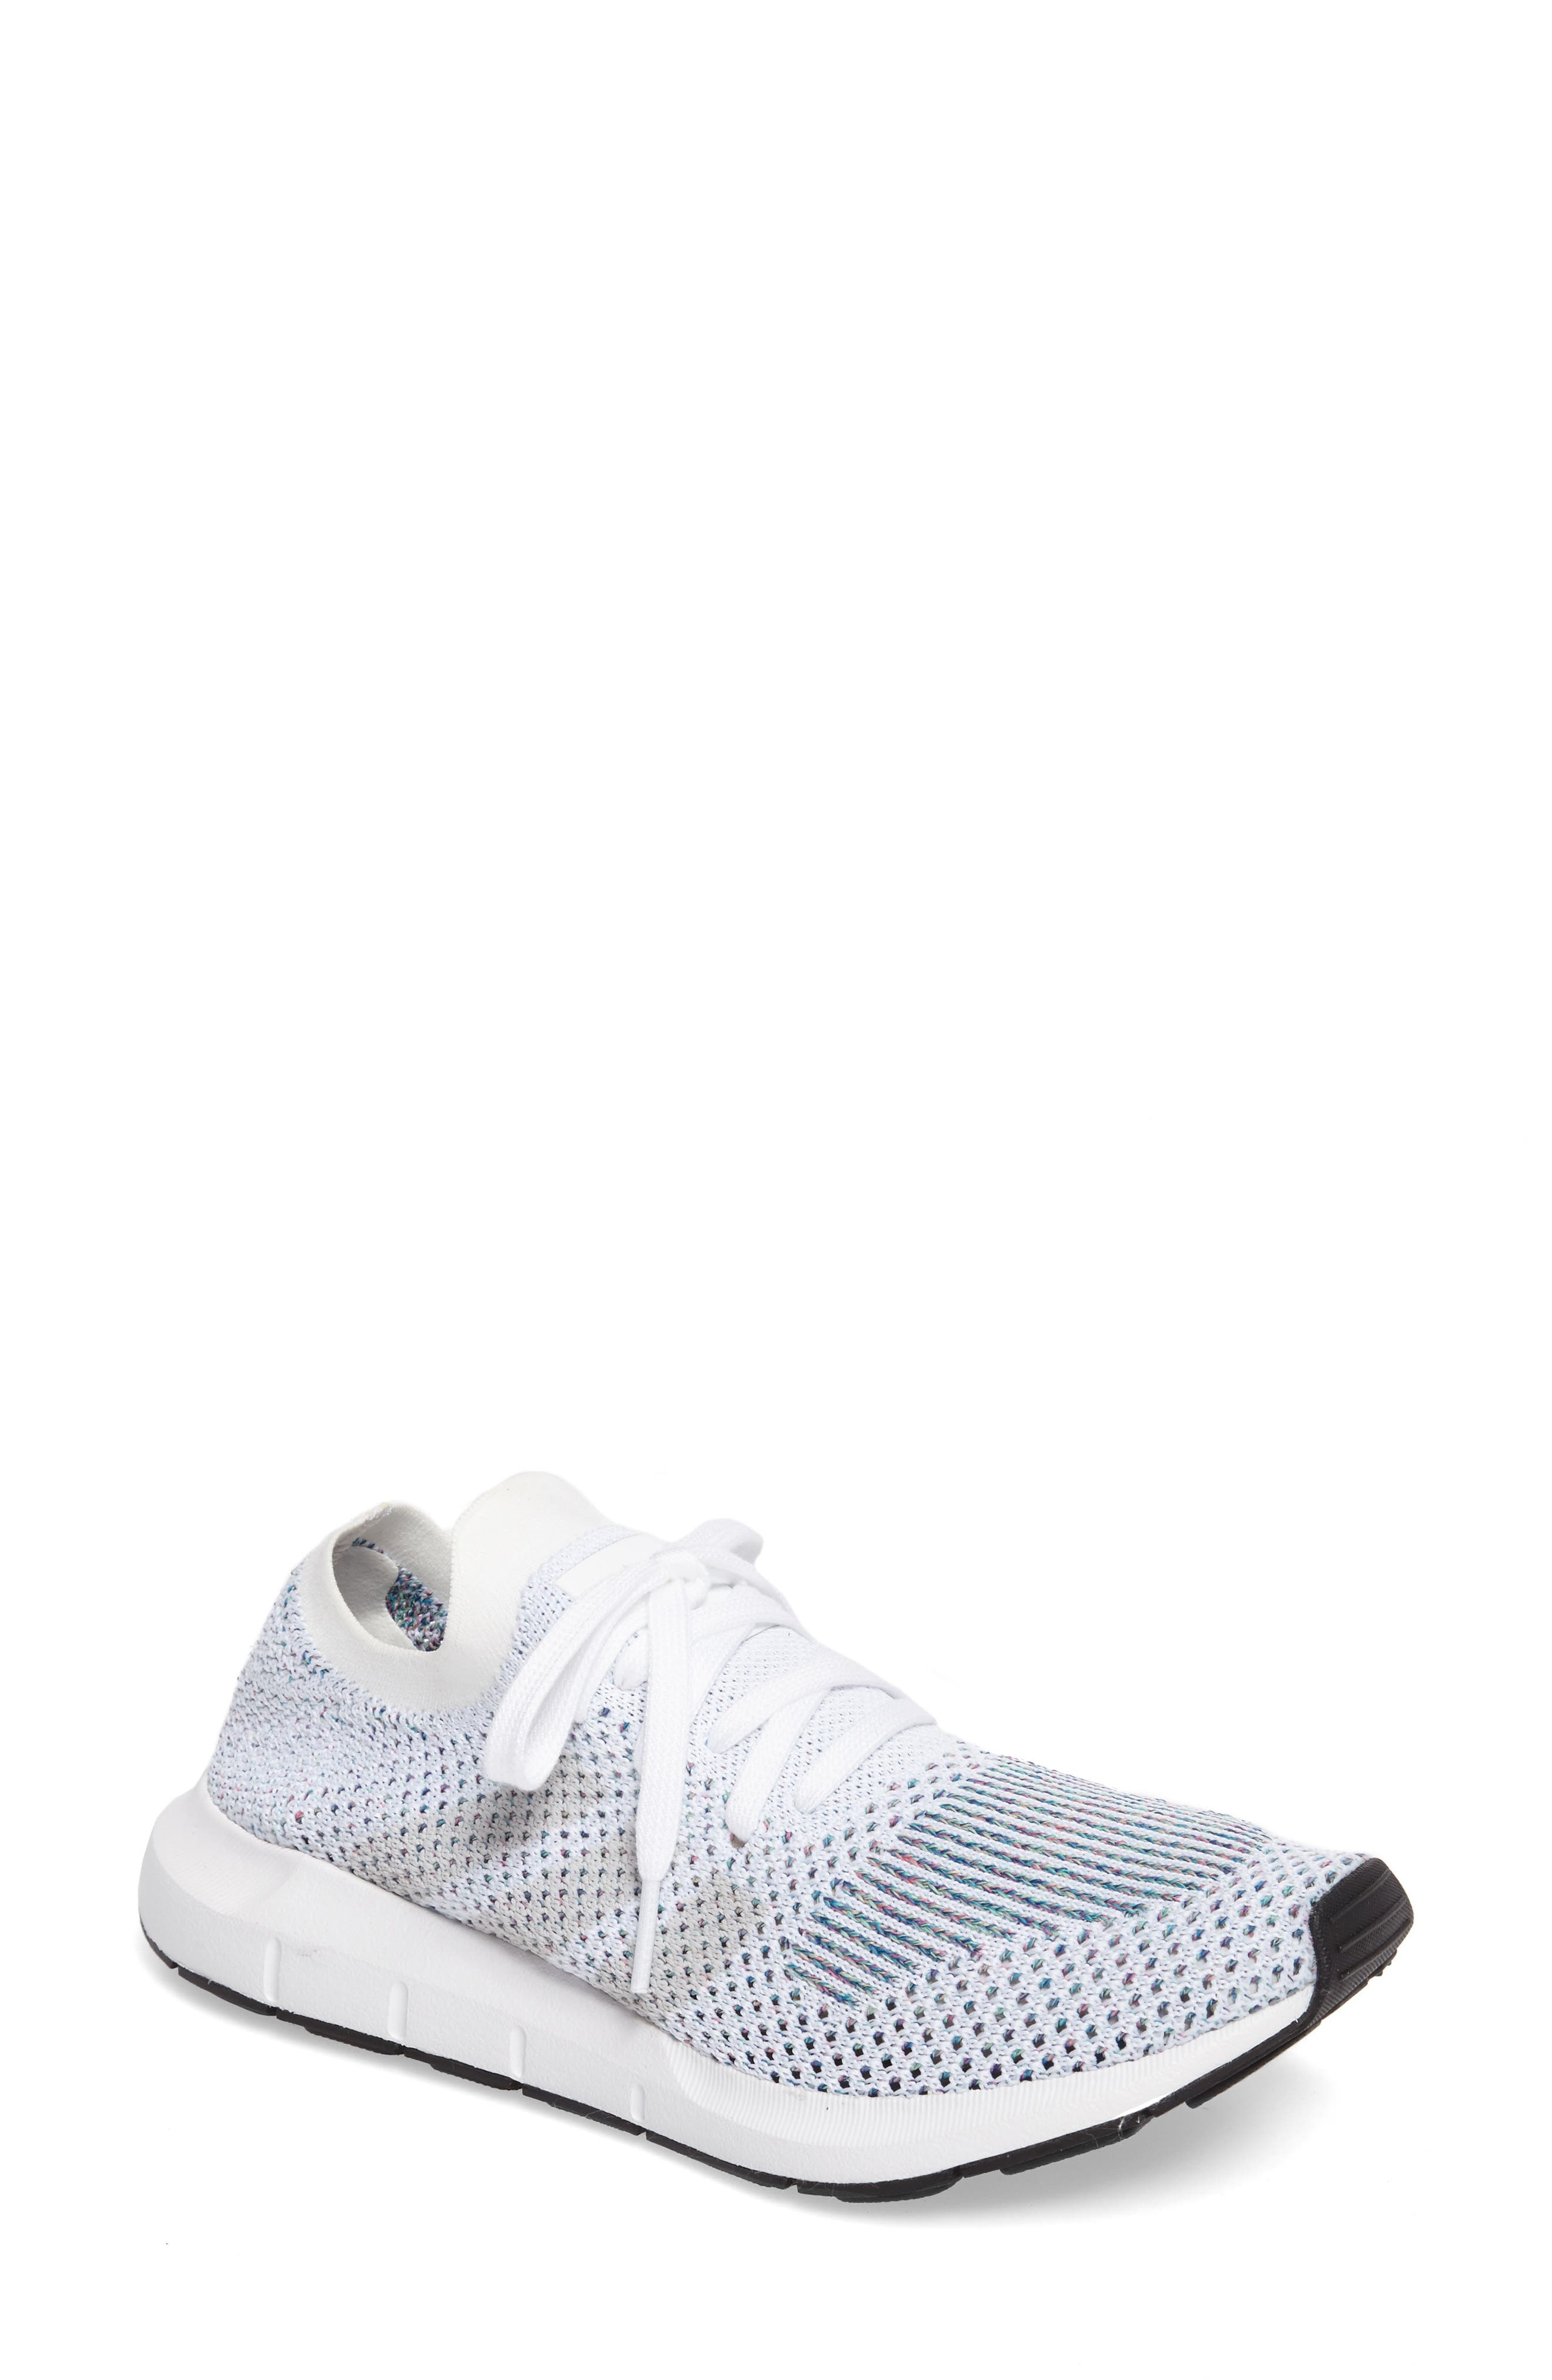 Swift Run Primeknit Training Shoe,                         Main,                         color, White/ Off White/ Core Black